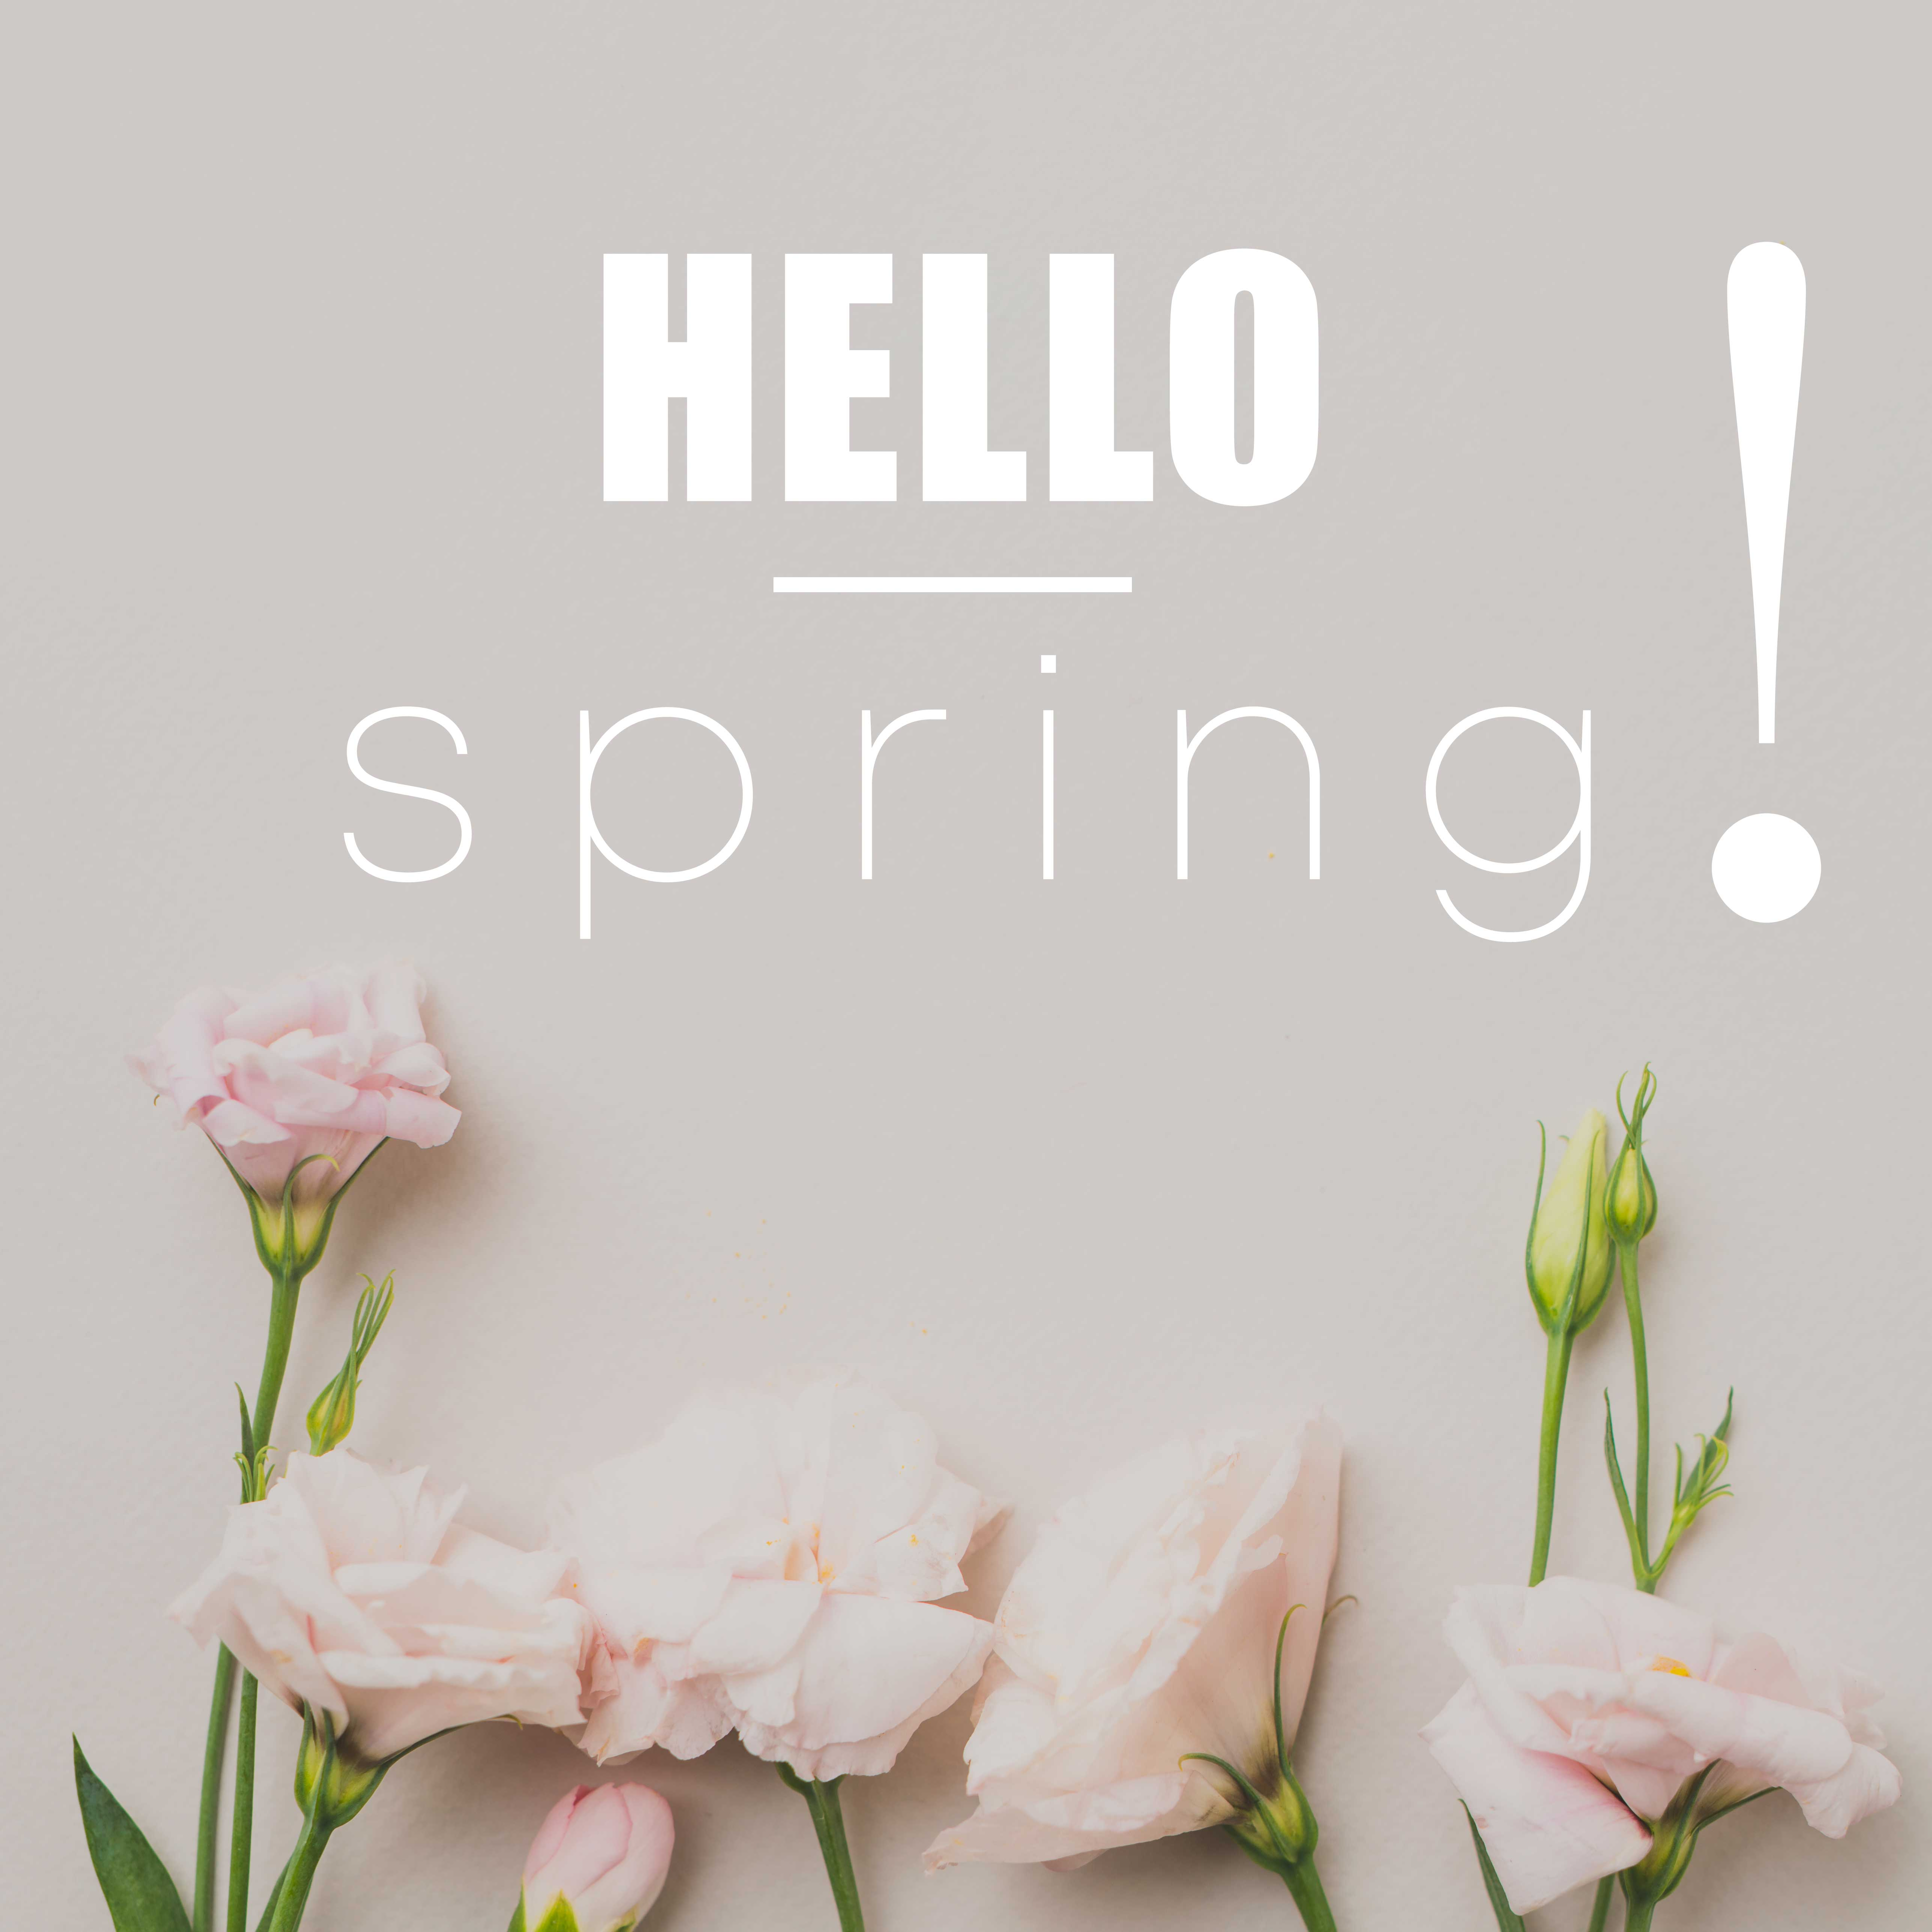 Весна, привет!